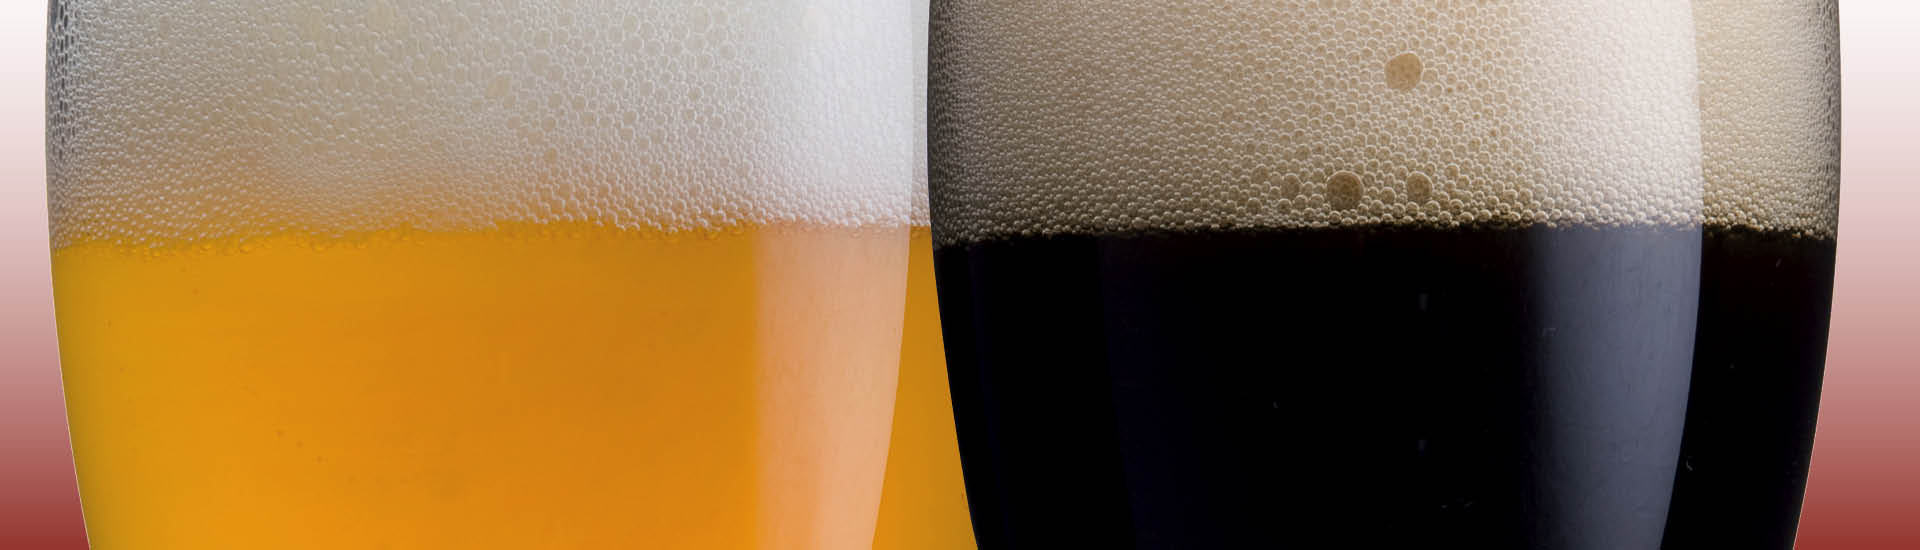 Biere - Biervielfalt: Hell vs. Dunkel! 05/2017 - Slider